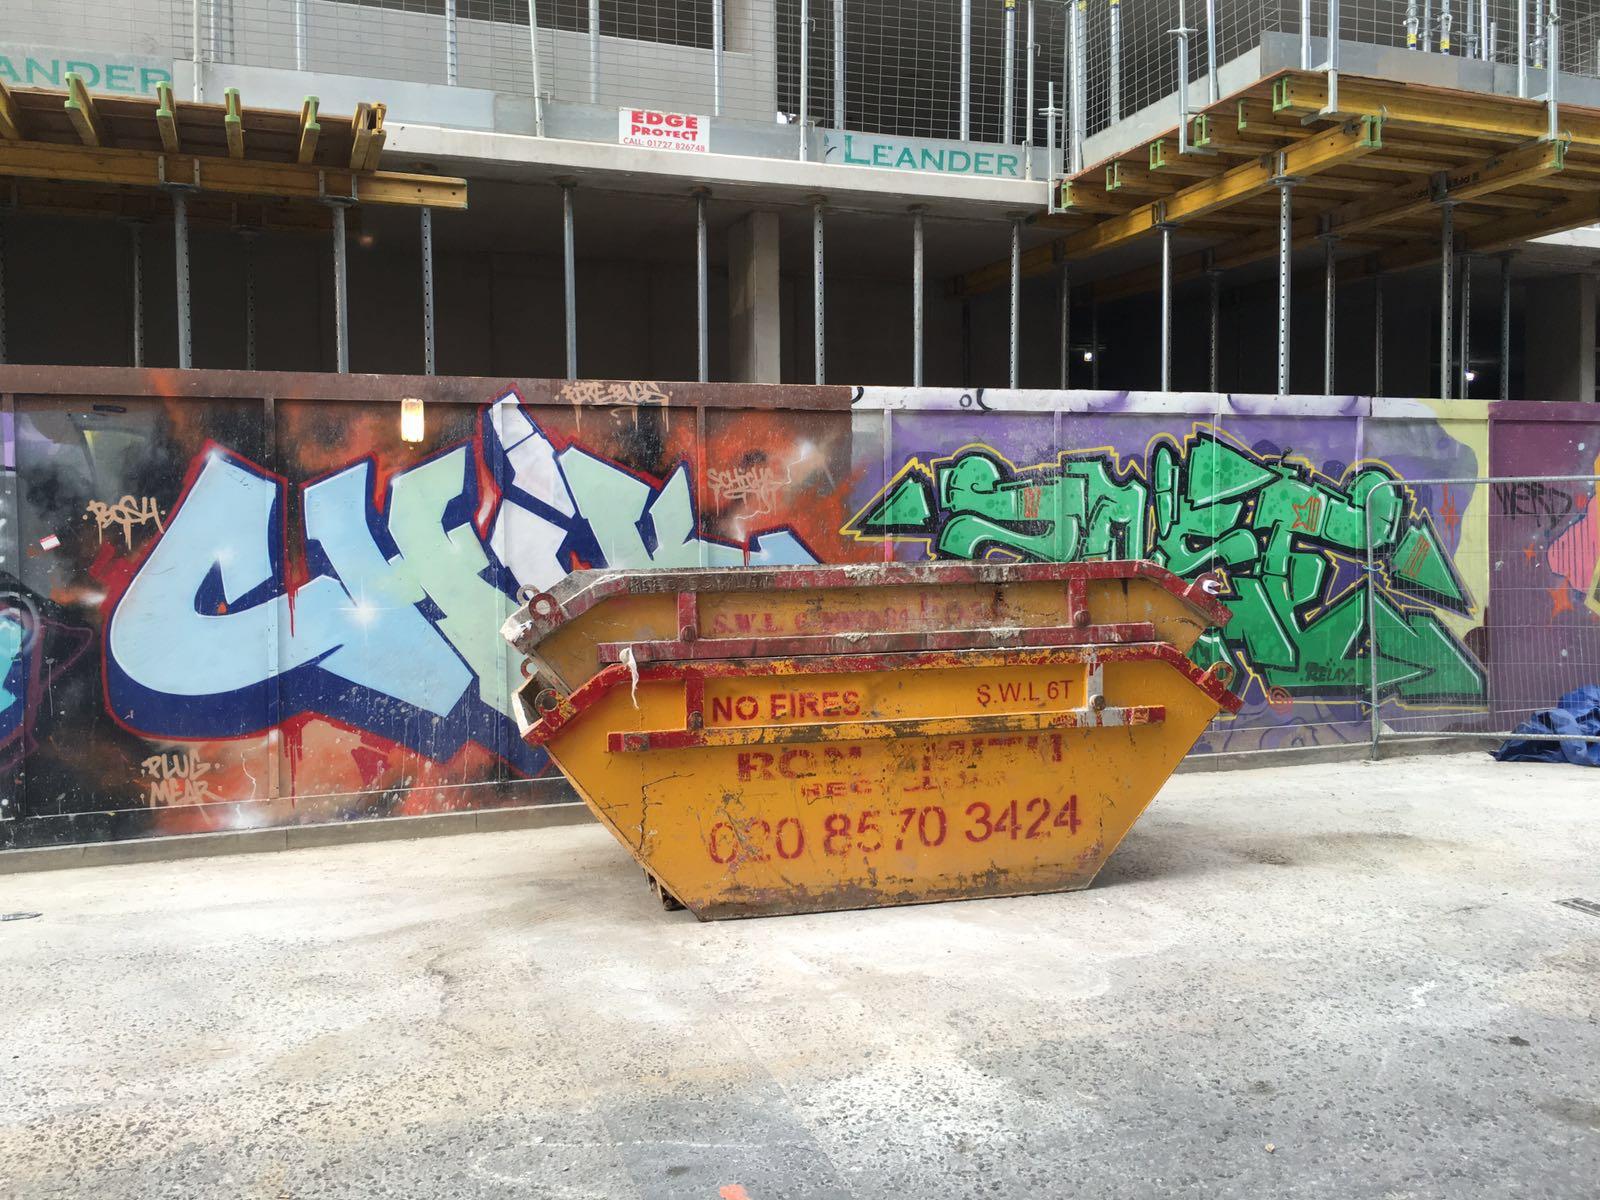 Findaskip Skips in front of graffiti